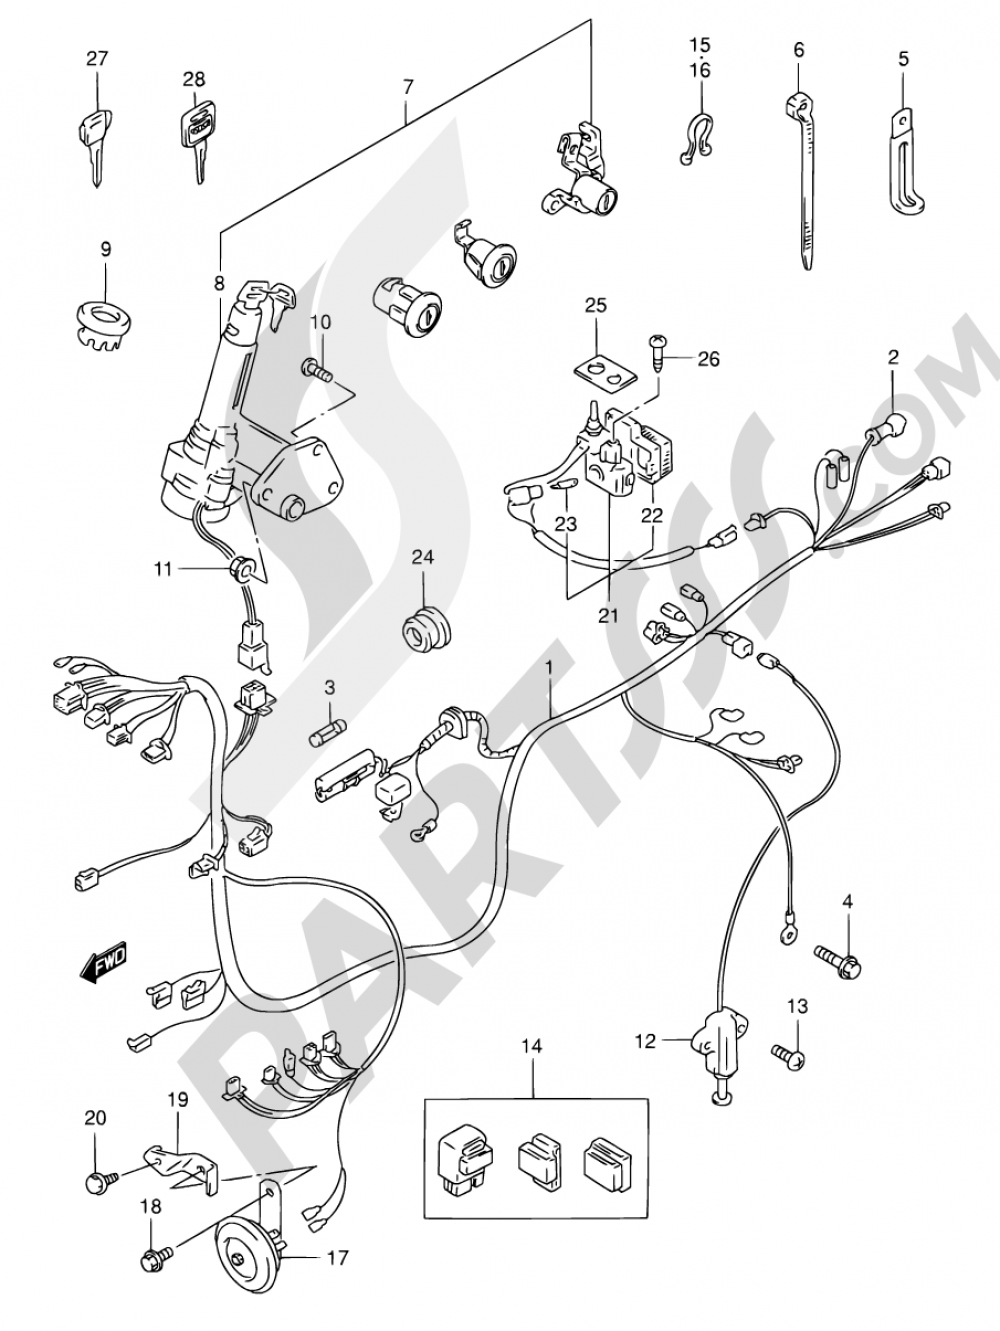 26A - WIRING HARNESS (MODEL Y) Suzuki AN125 2000